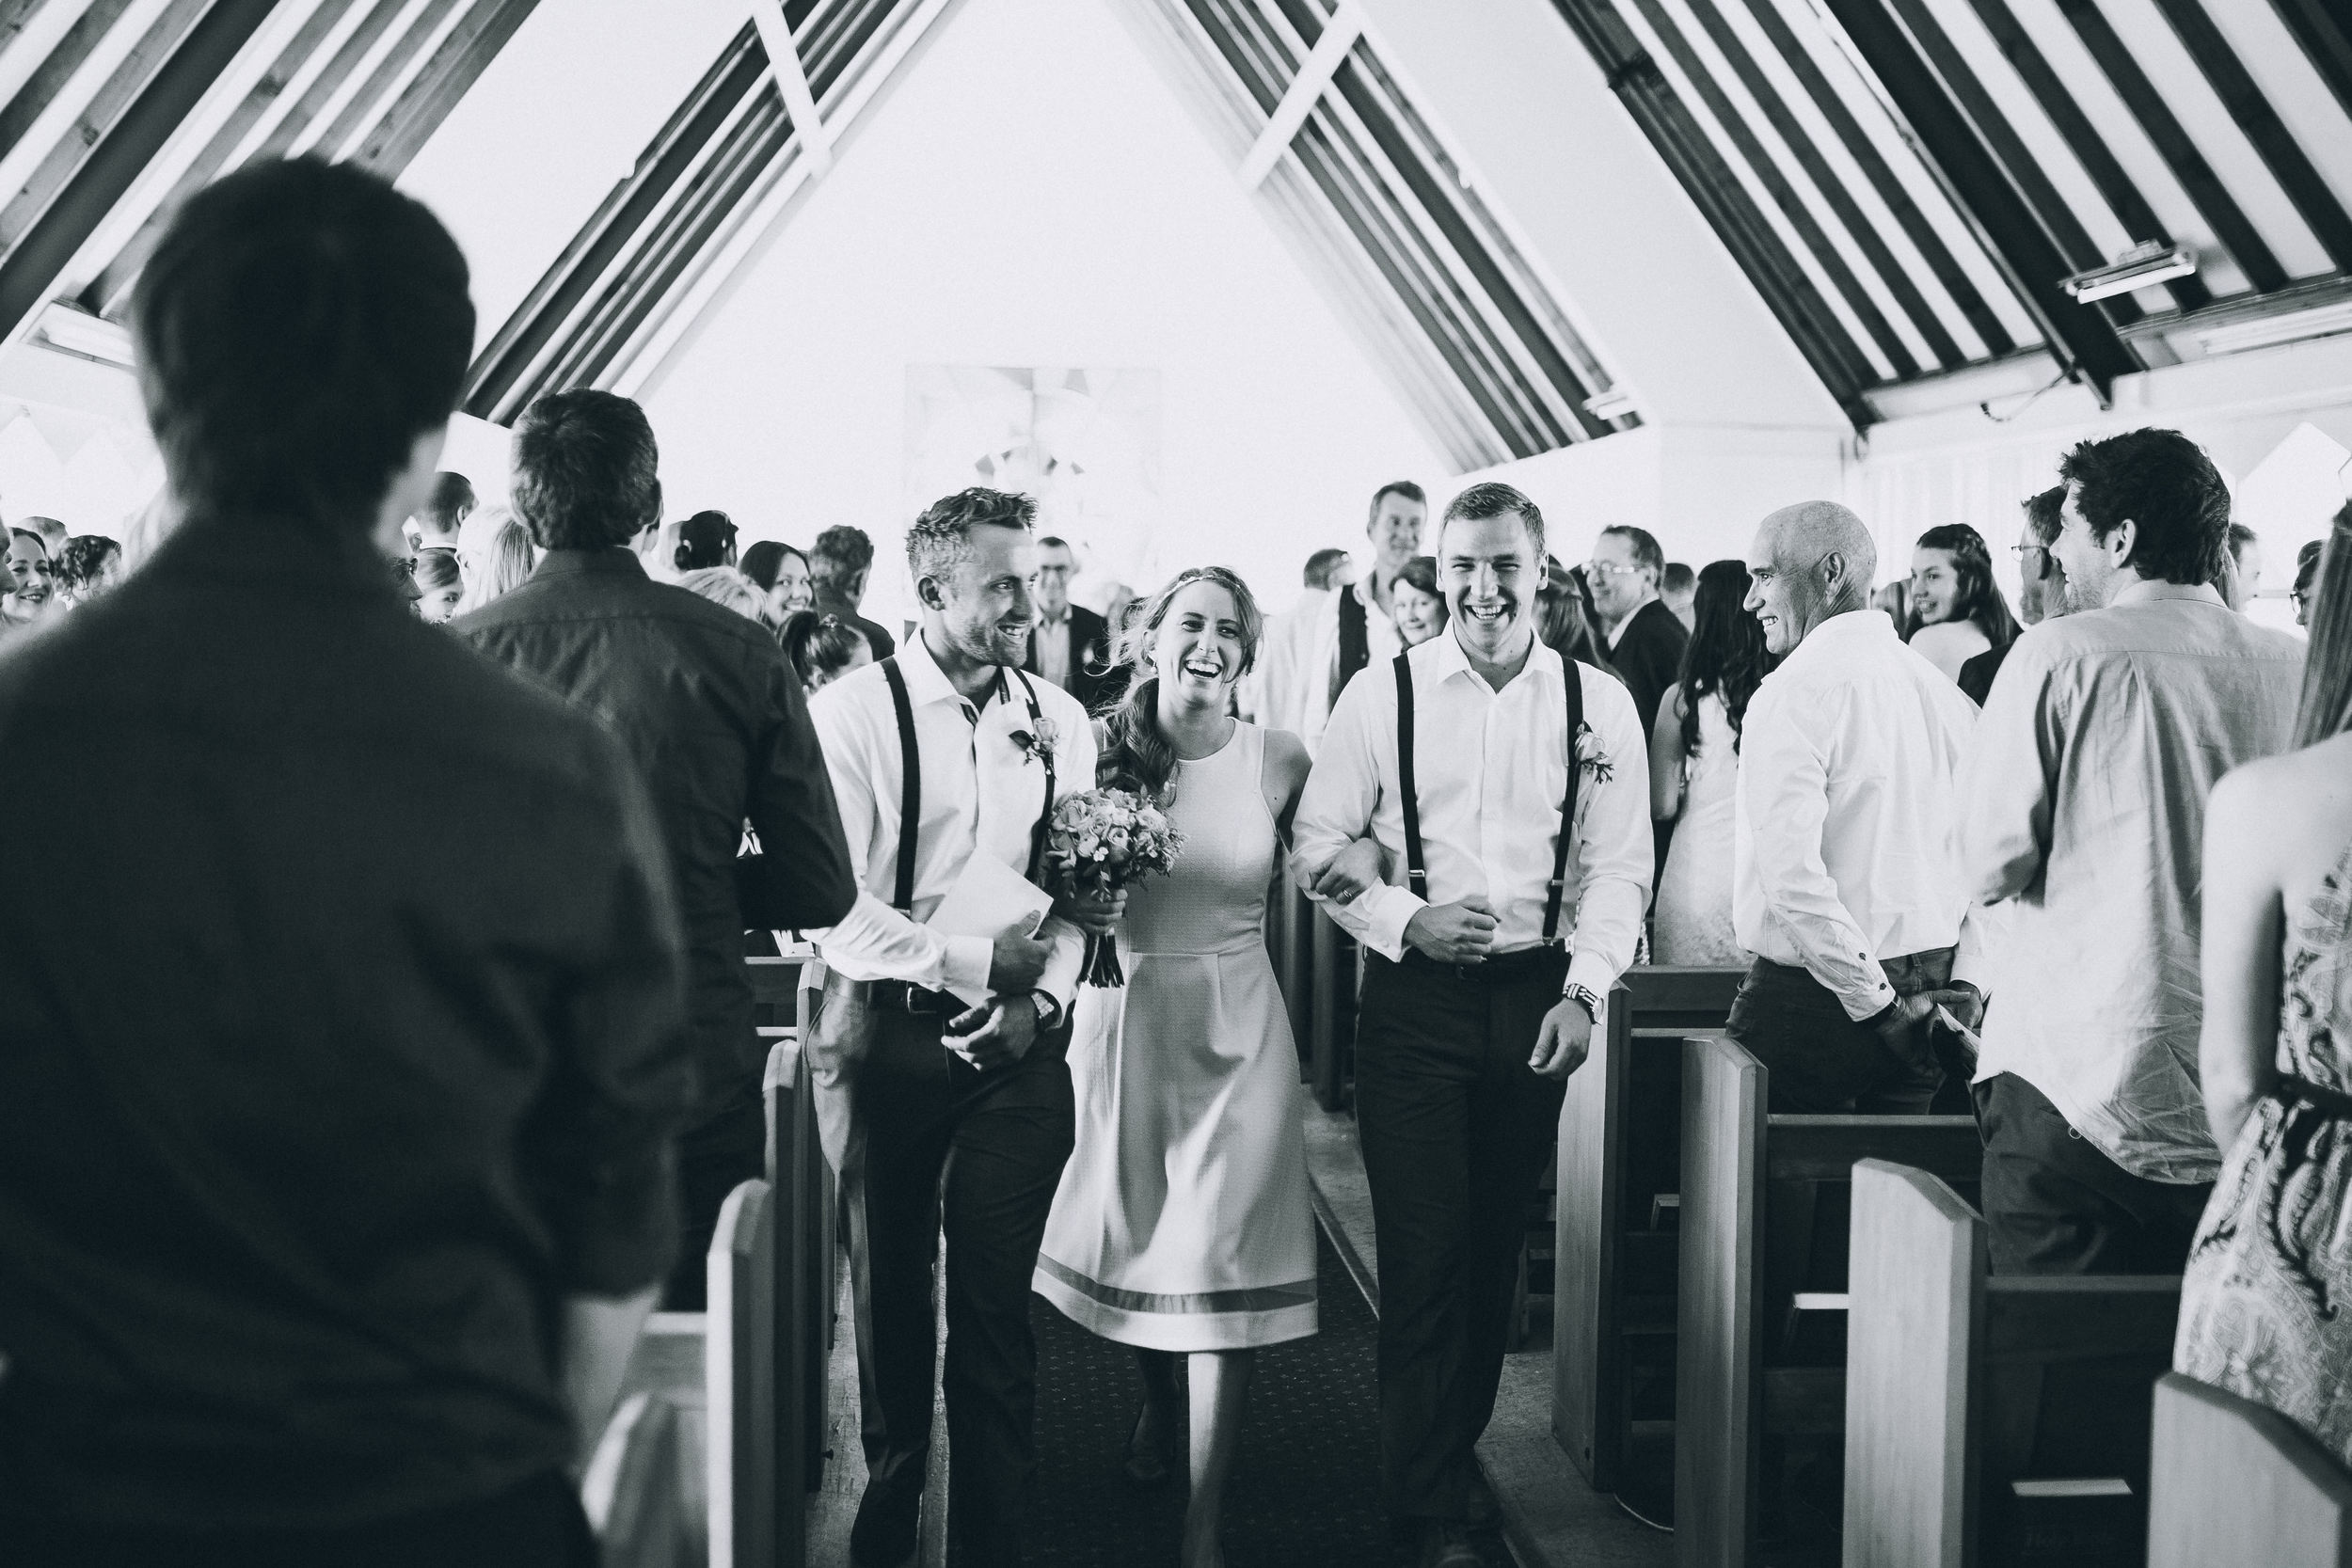 Shivonne & James - Ceremony Monochrome-203.jpg